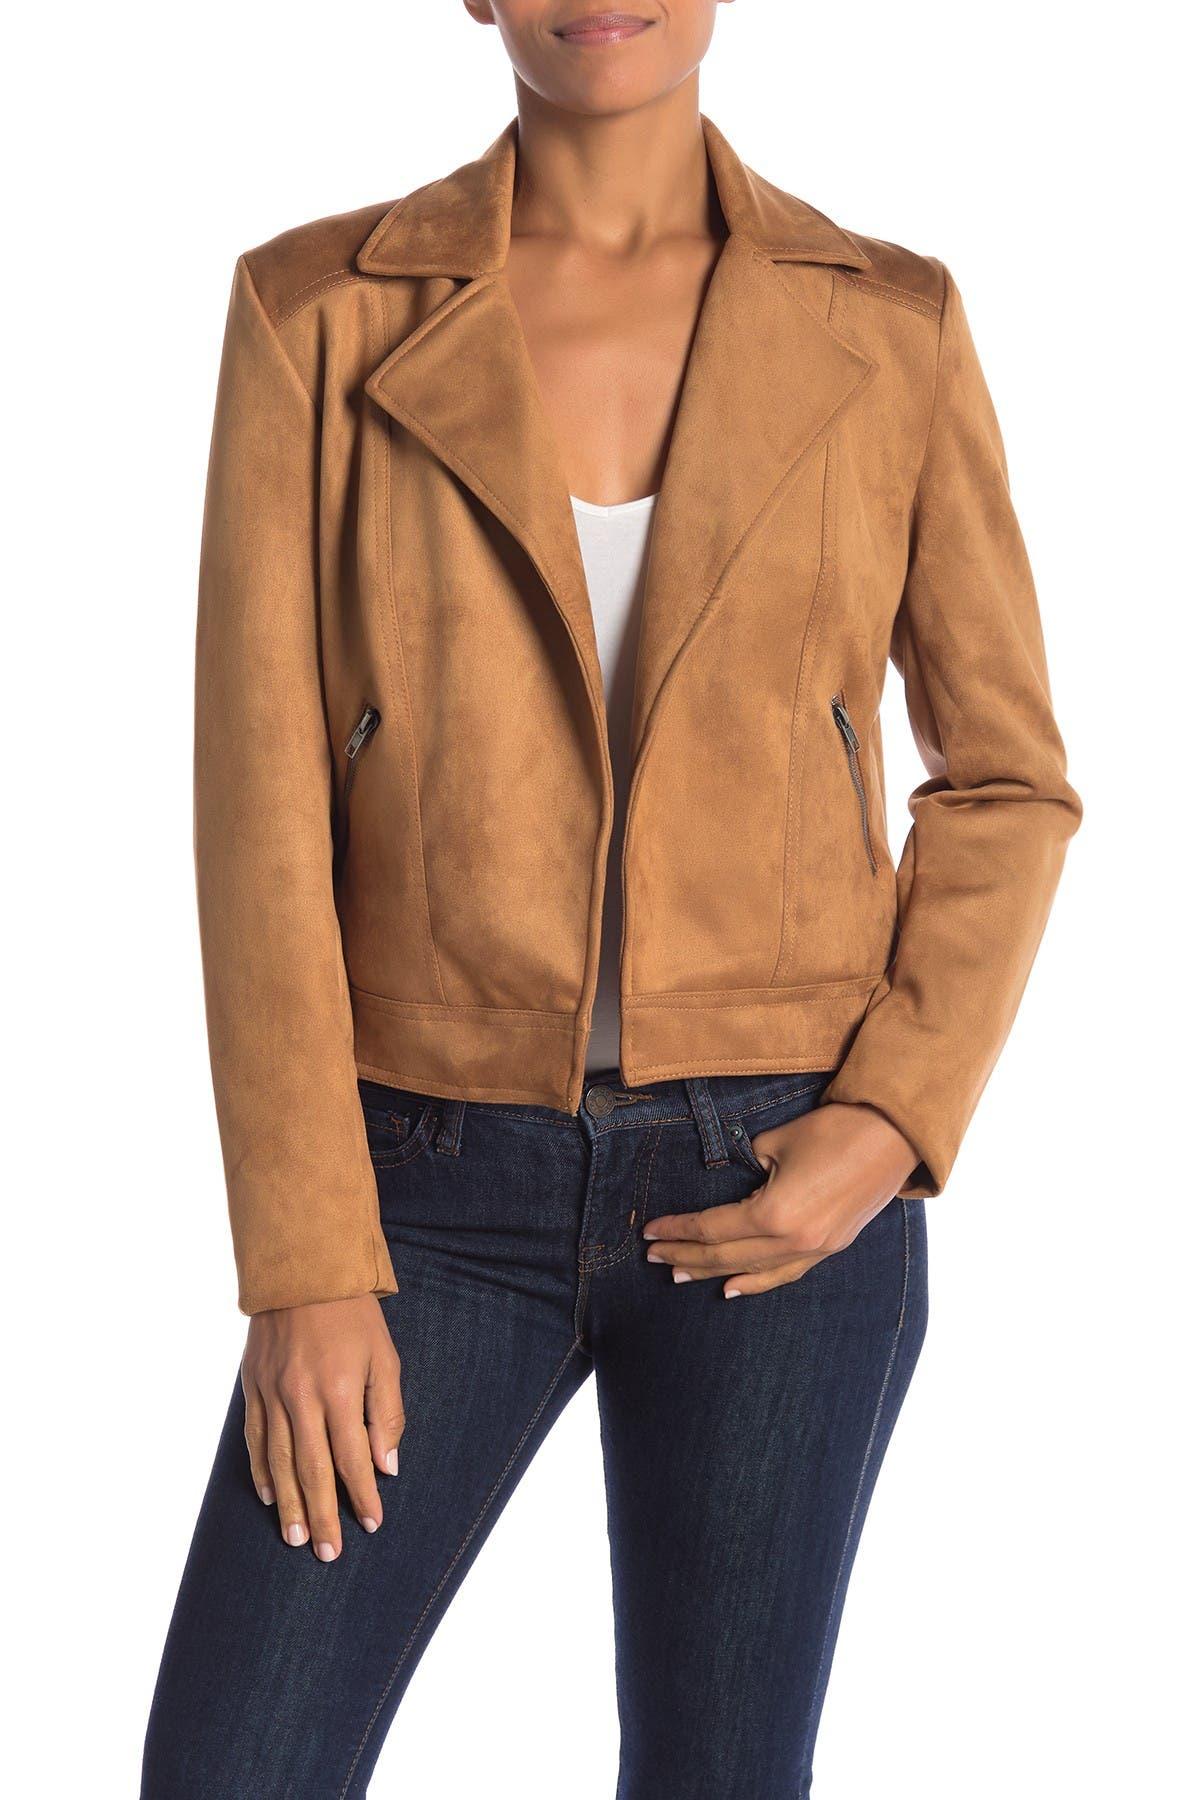 Image of Philosophy Apparel Faux Suede Moto Jacket